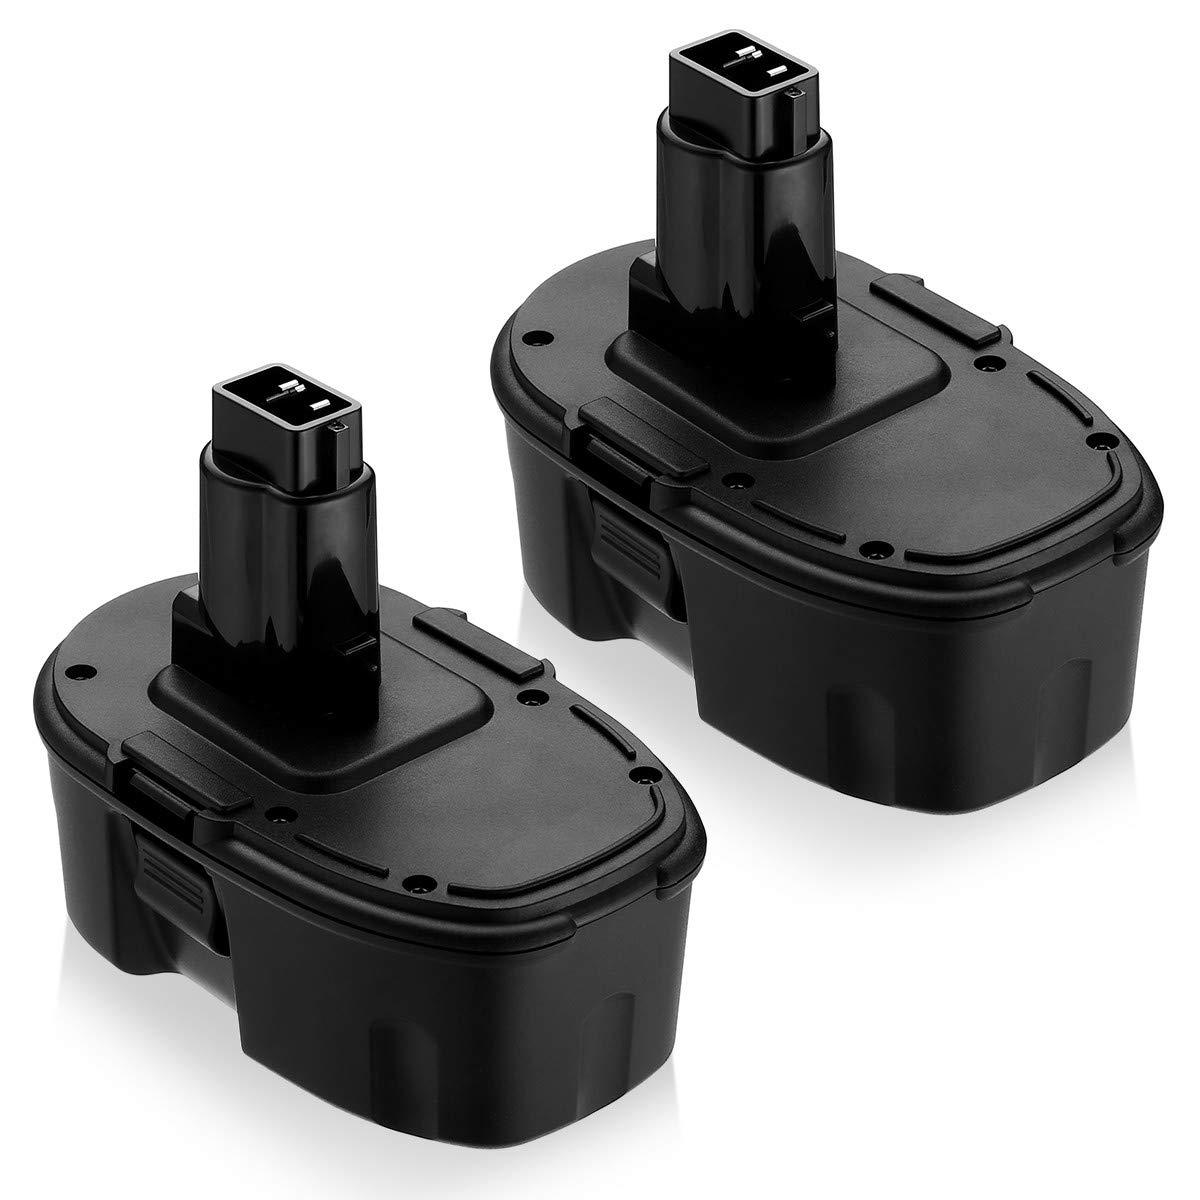 {Upgraded}18V 2Pack DC9096 DC9098 Replacement Battery for Dewalt 18 Volt XPR Battery DC9096 DC9098 DC9099 DW9095 DW9096 DW9098 DE9038 3700mAh Cordless Power Tools NI-MH